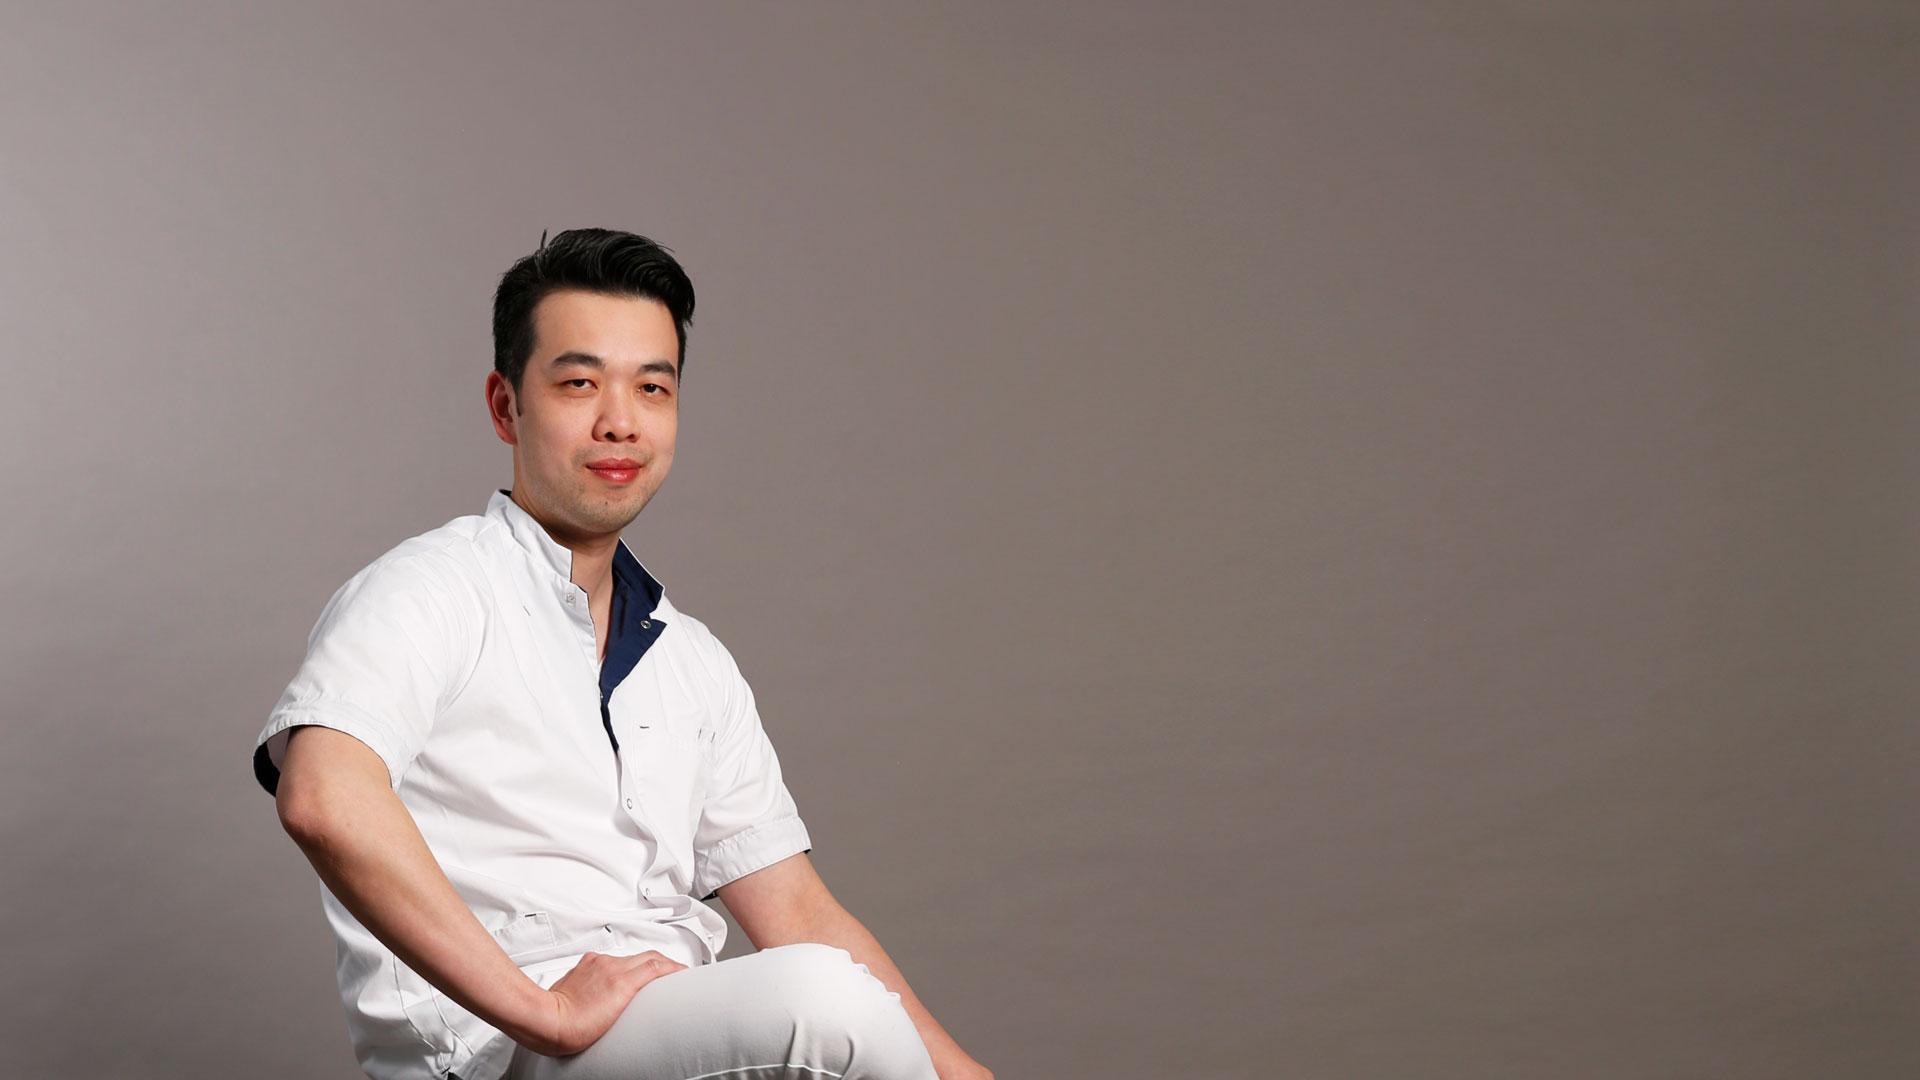 Doctor Wing Yuen